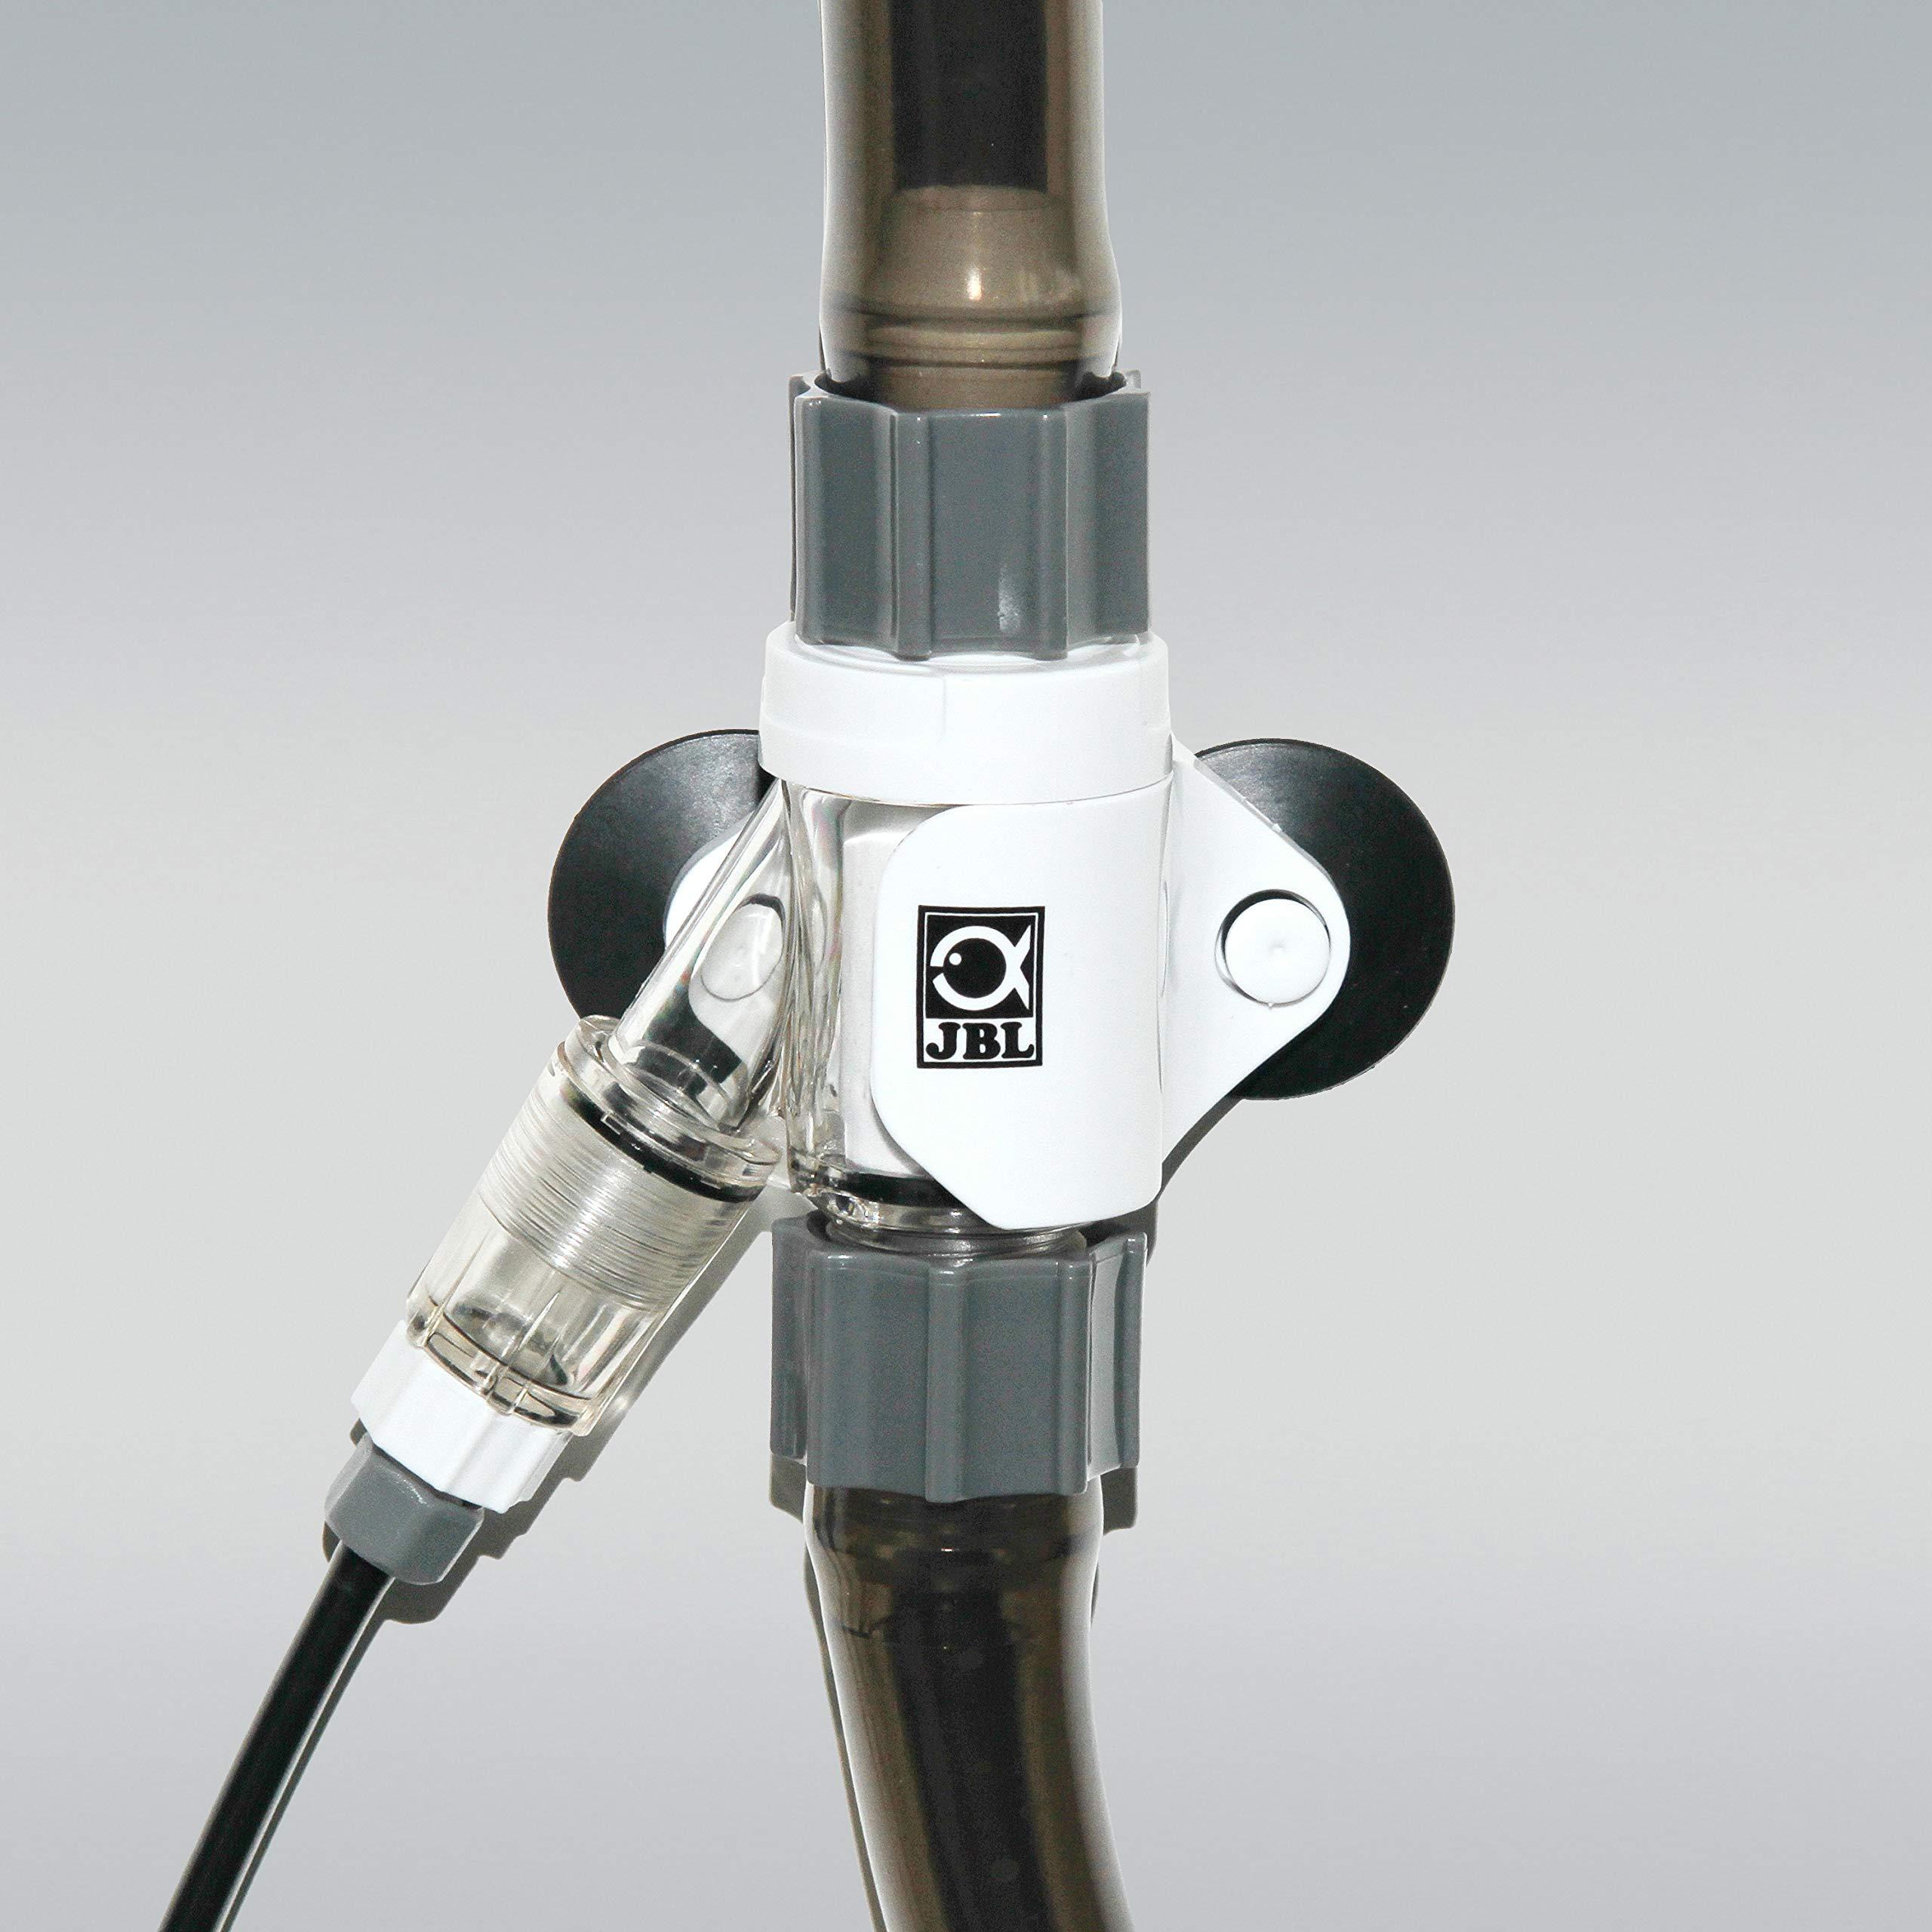 JBL 6334100ProFlora Direct 19/25(Inline Diffuser)